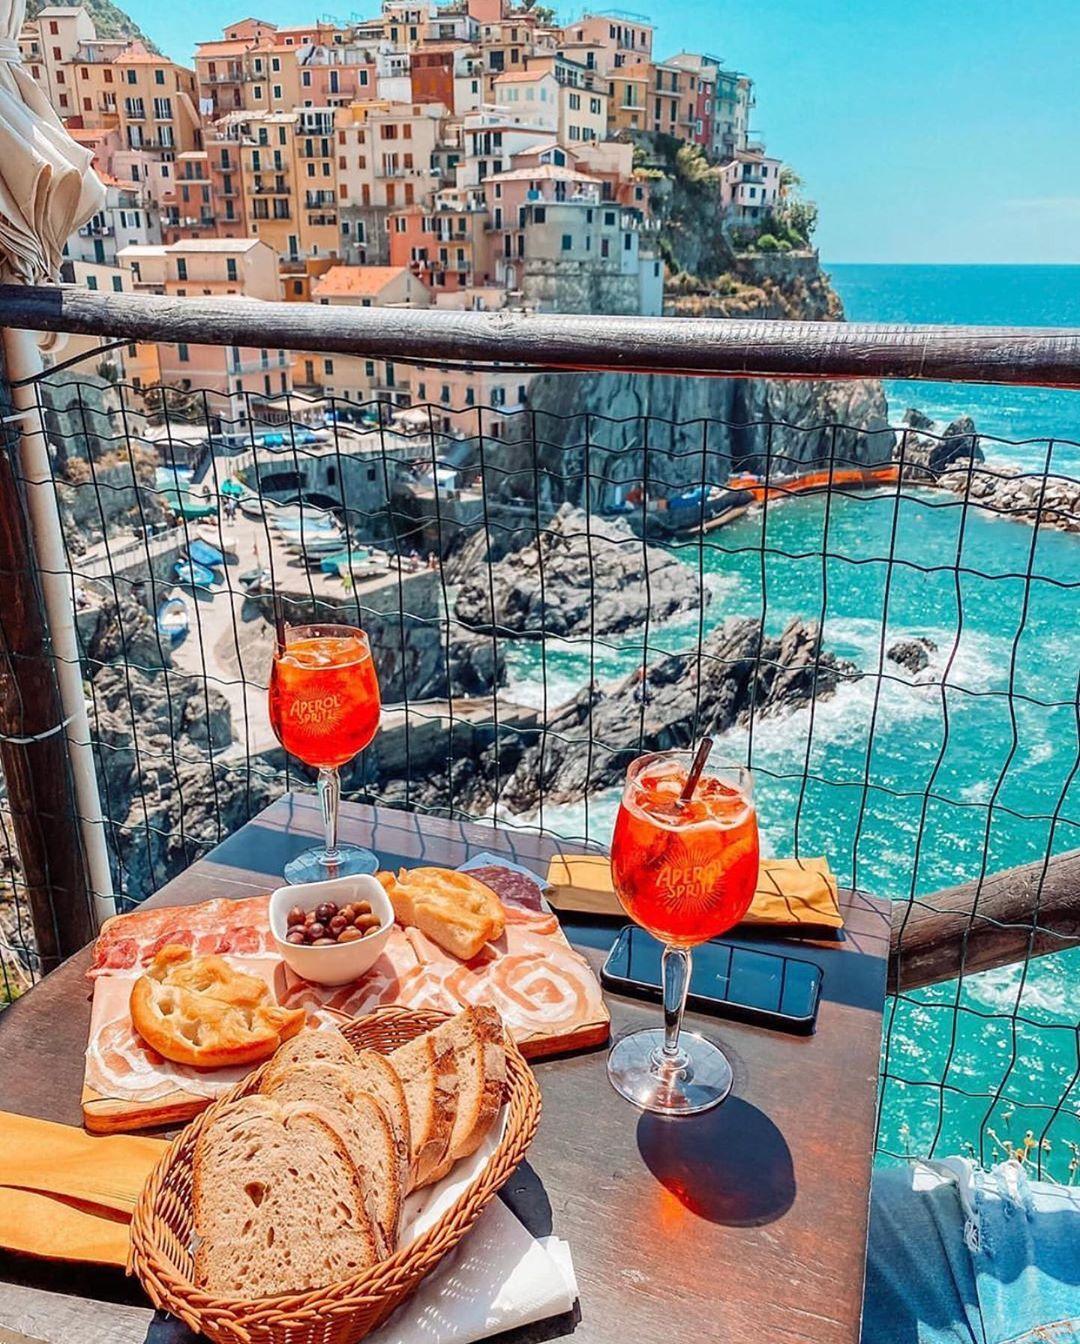 "Italy • Benvenuti a tutti! on Instagram: ""Yes please! 🙋♀️🙋♂️  📍Manarola 📷 @miabeschieri · · · · #Italy #Italia #Italian #ItalianGirl #ItalianFood #visititalia #roma #rome…"""